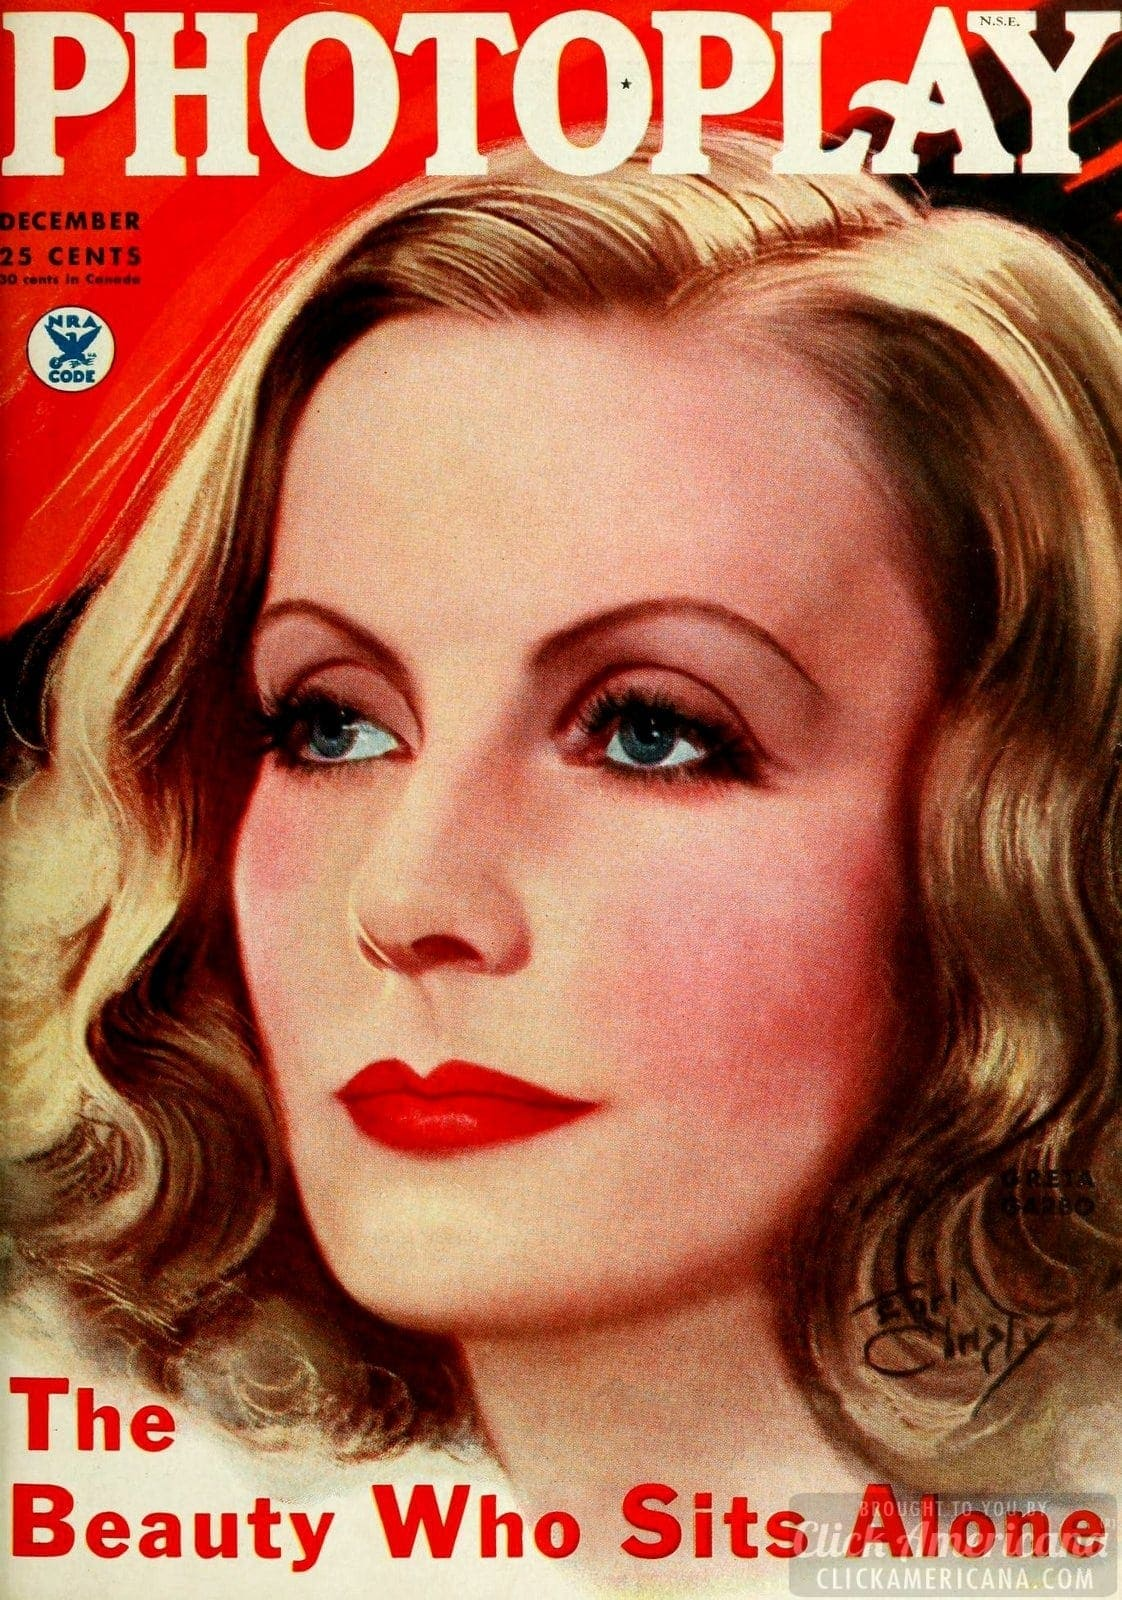 Greta Garbo on cover of Photoplay - December 1934